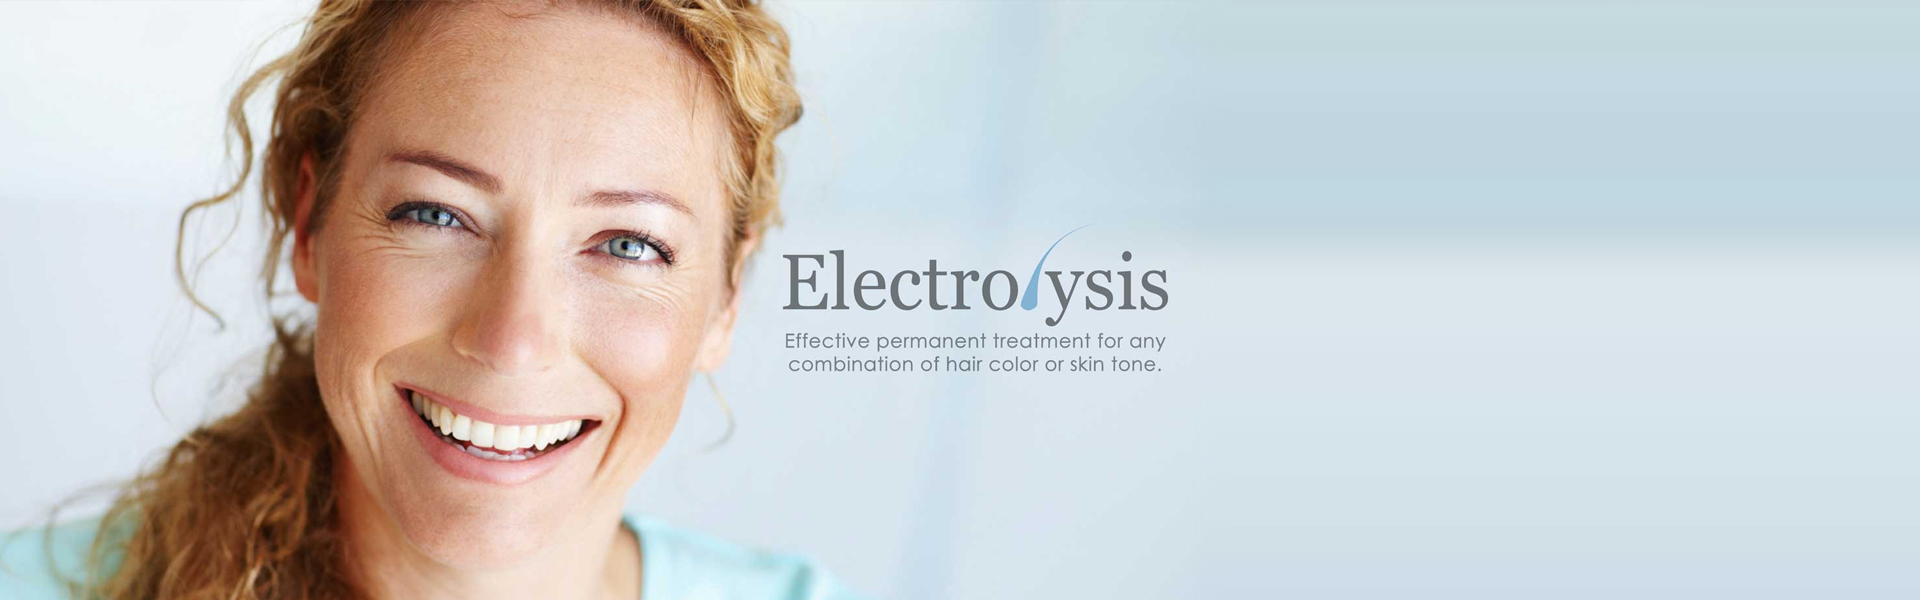 Electrolysis Hair Removal | Achieve Wellness Spa